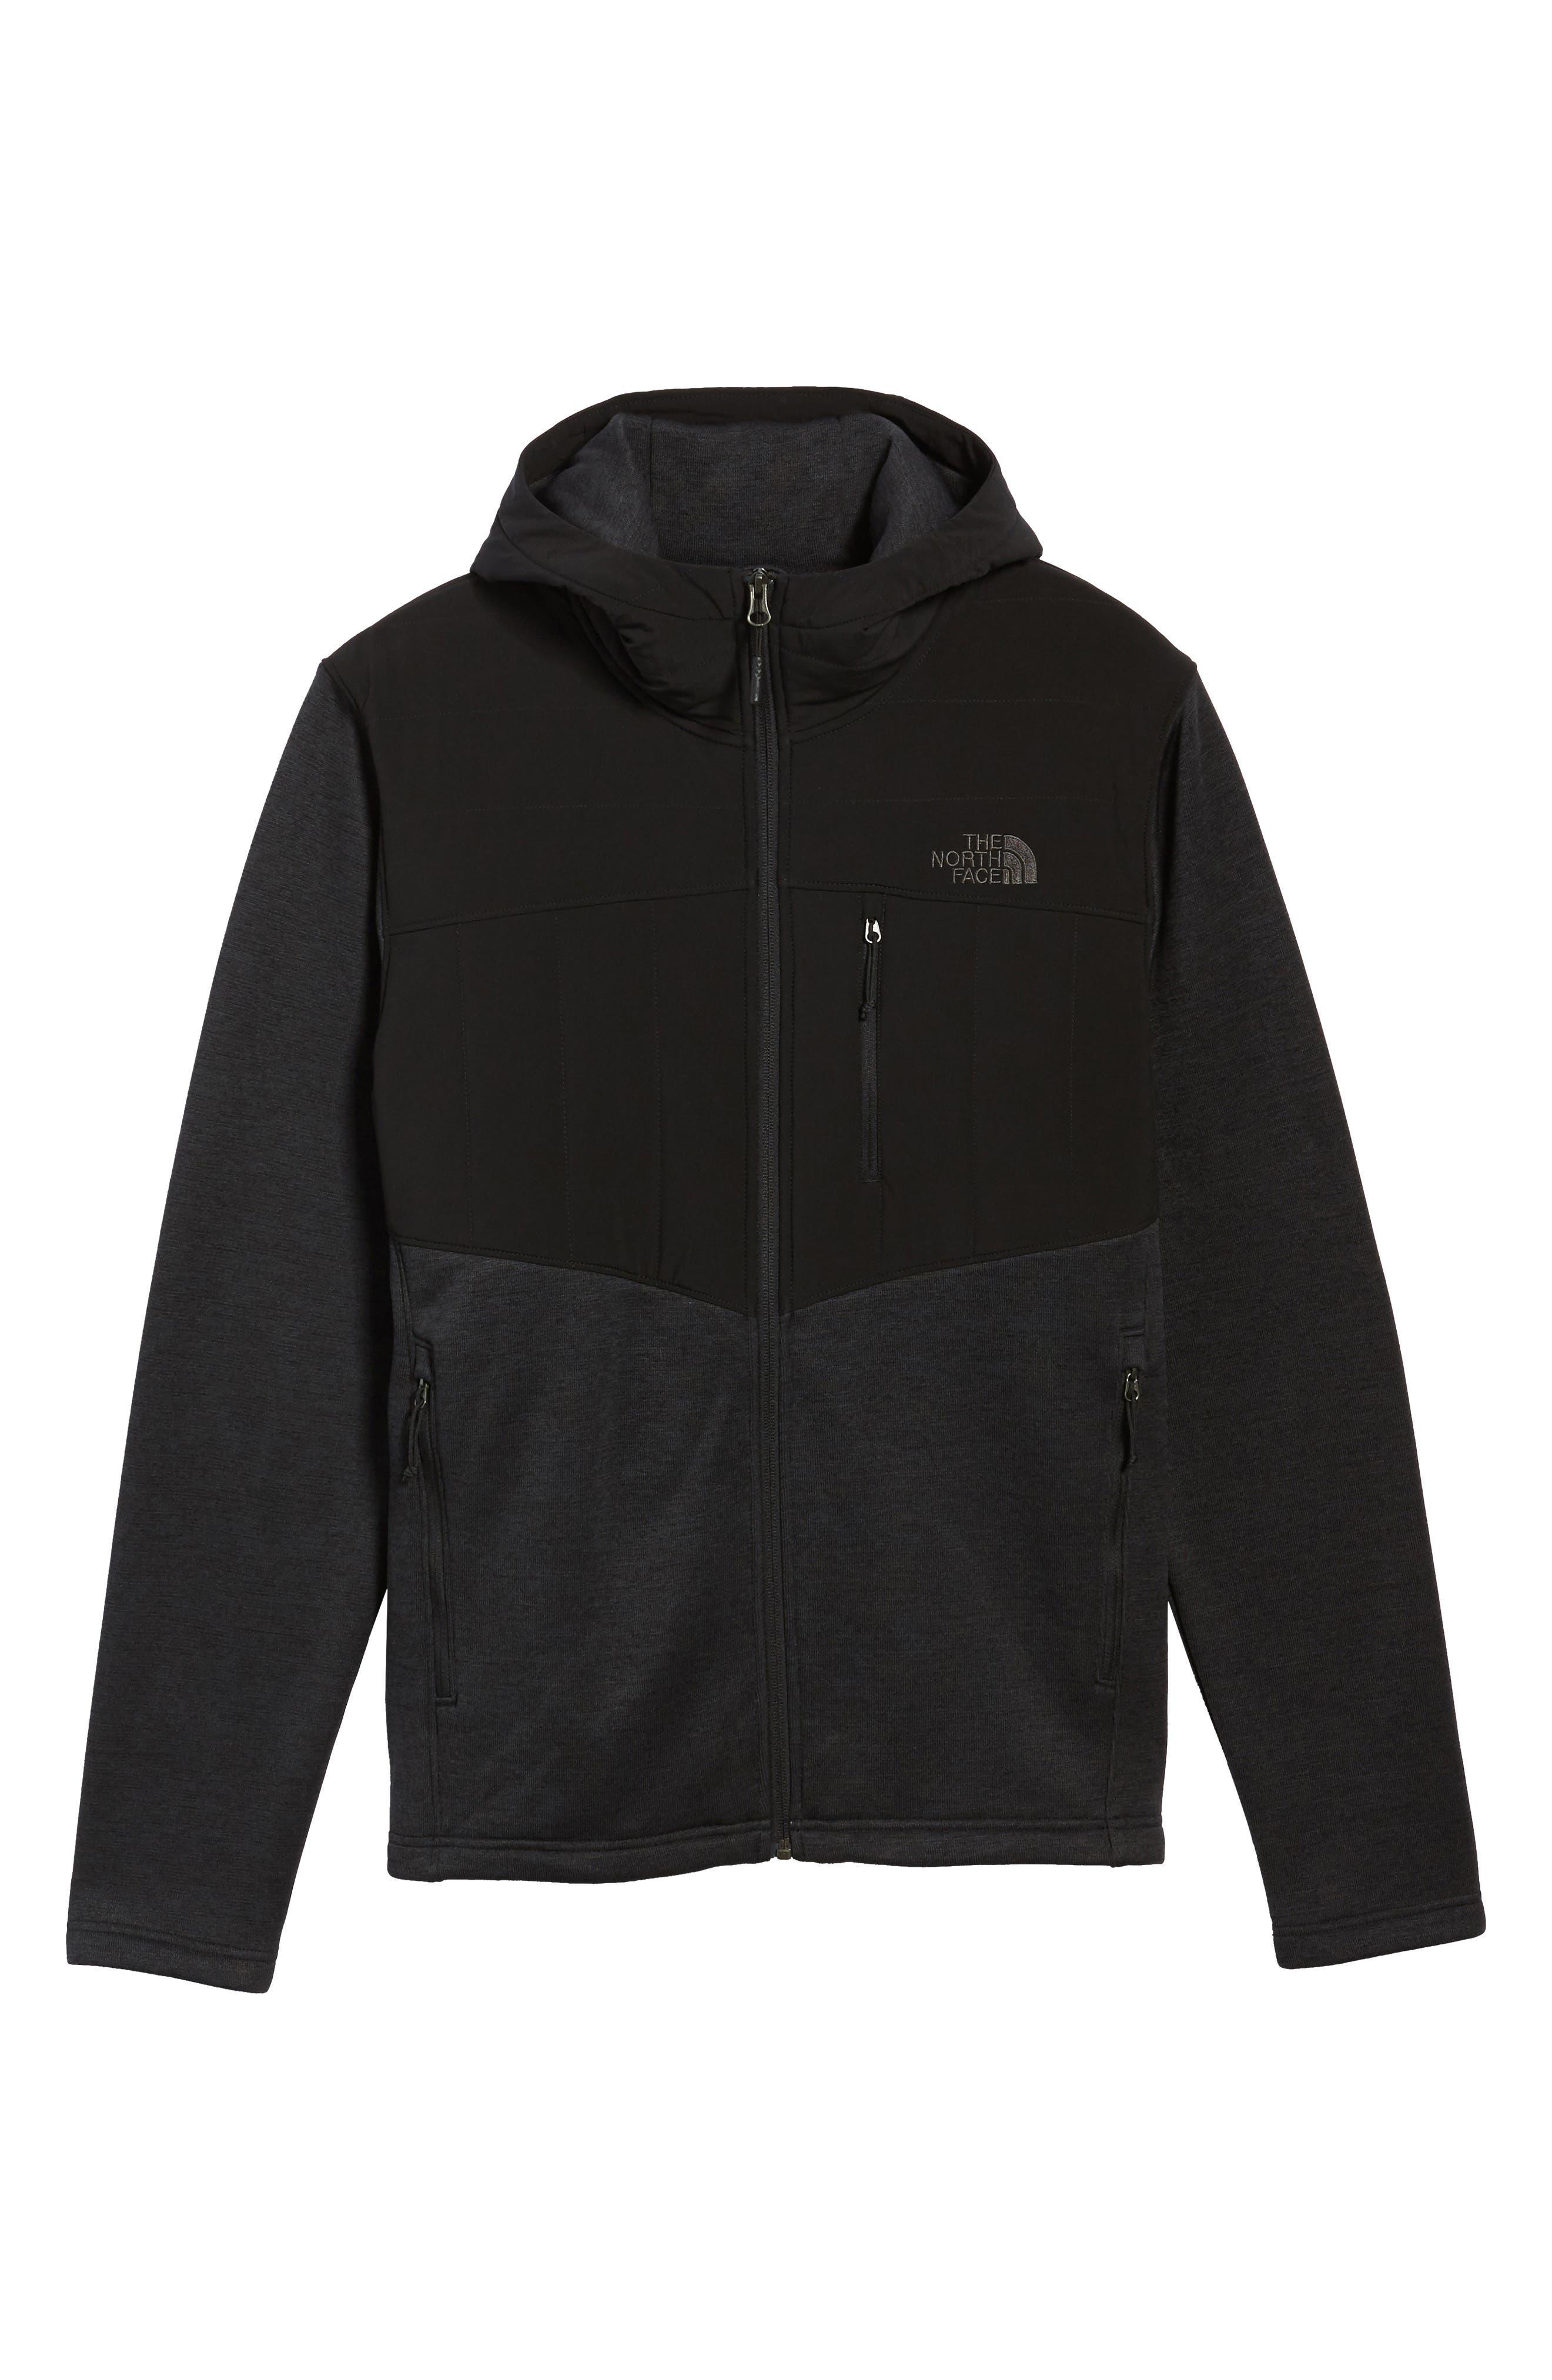 Norris Insulated Fleece Jacket,                             Alternate thumbnail 6, color,